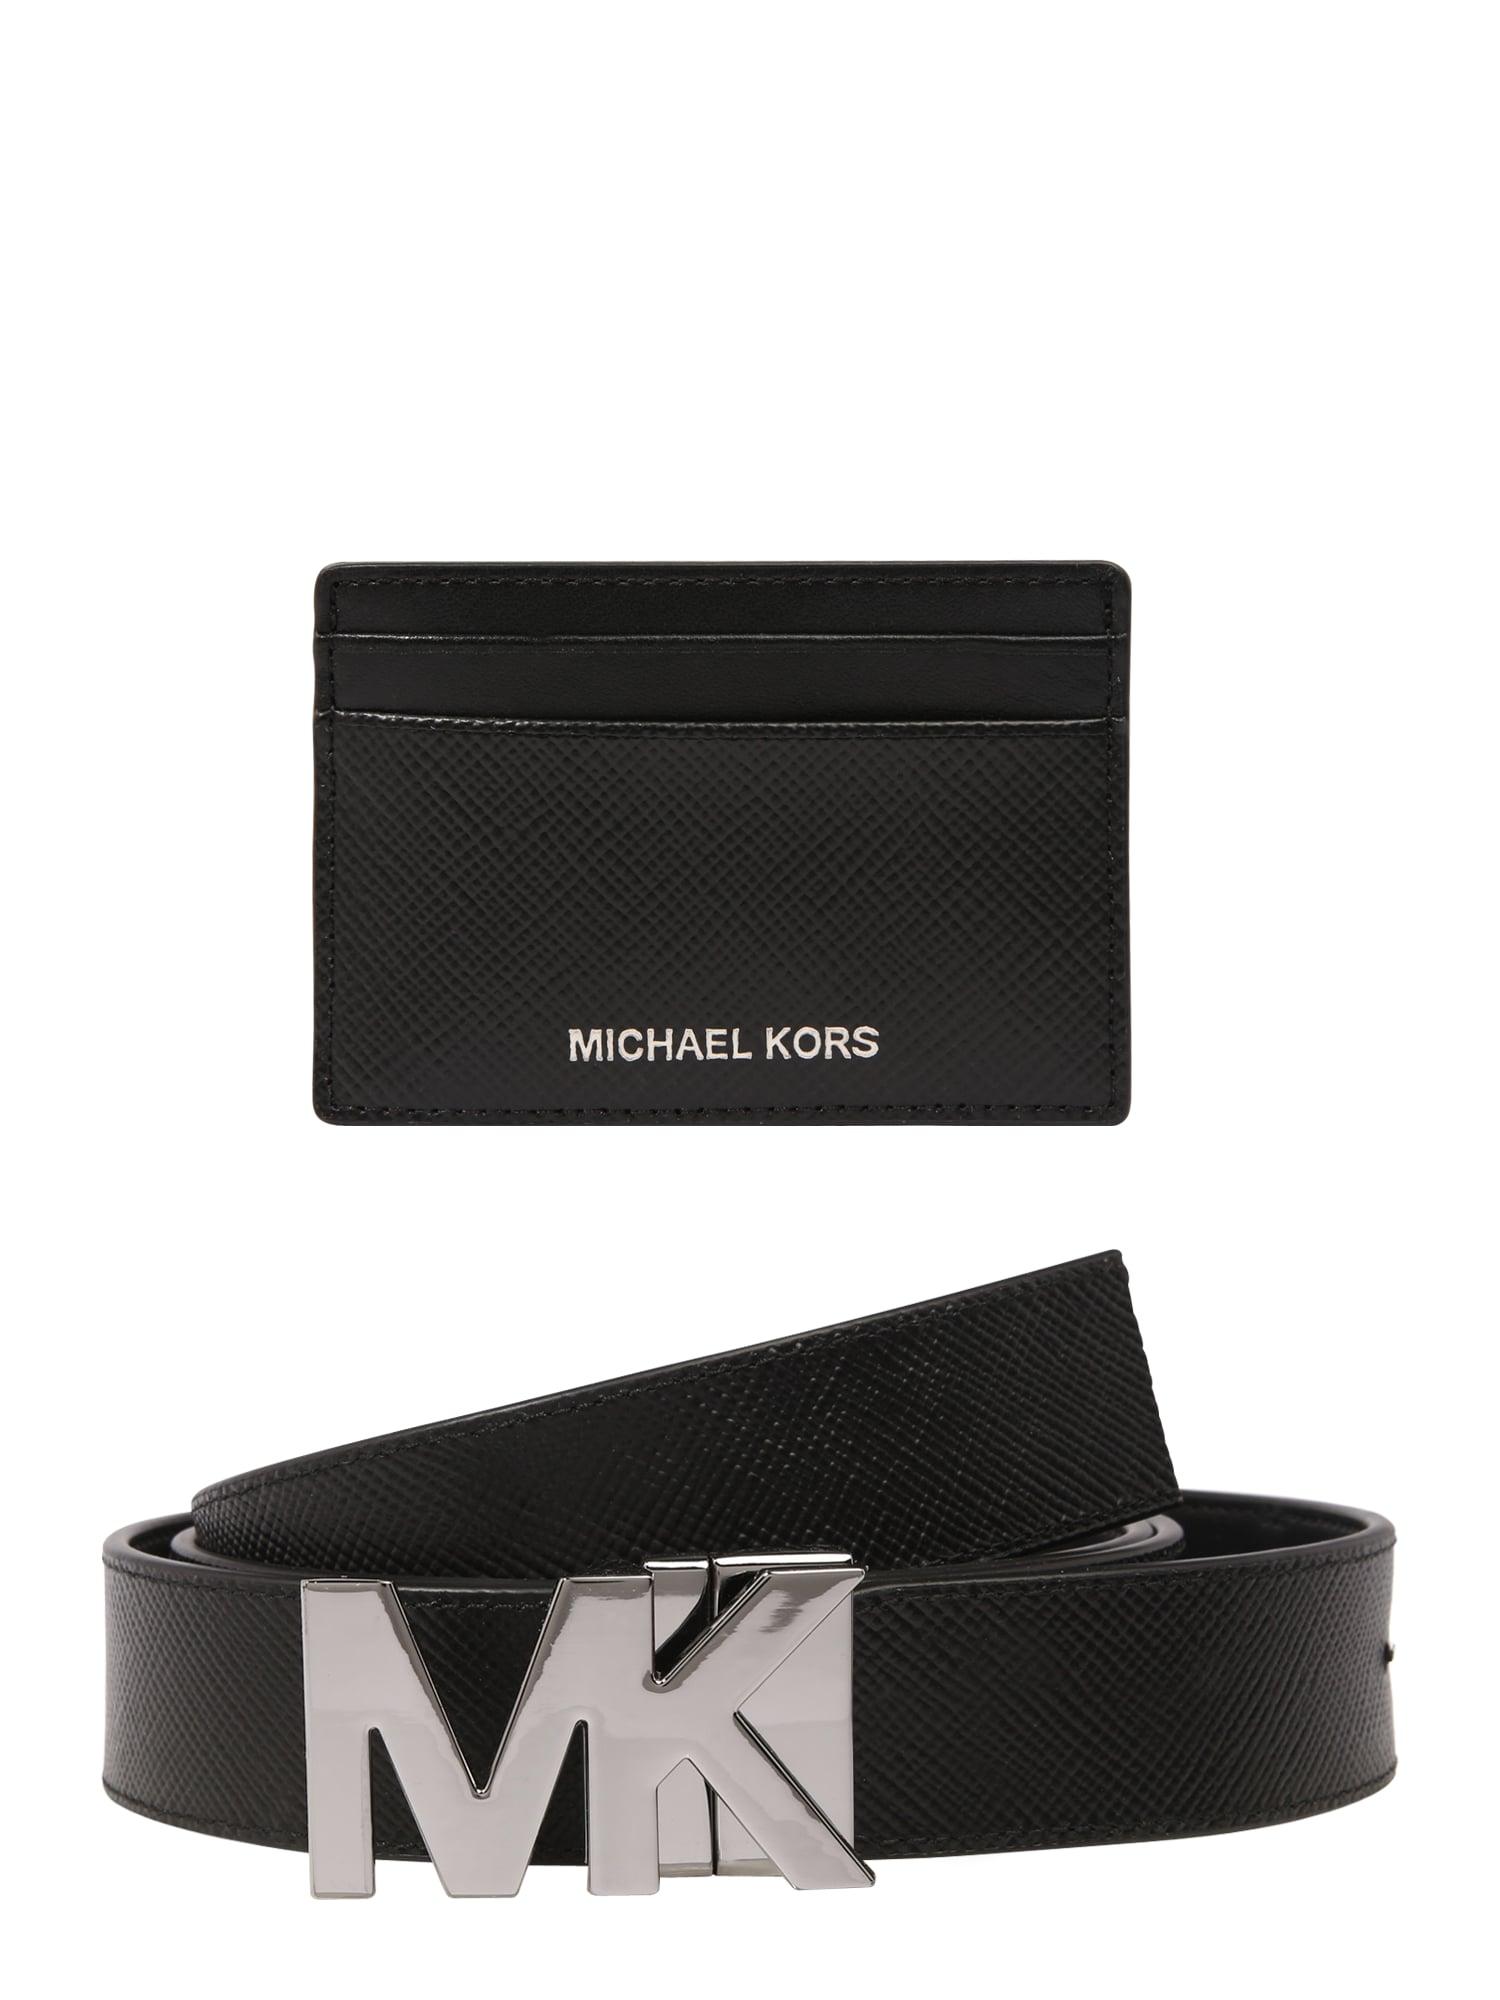 Michael Kors Diržas juoda